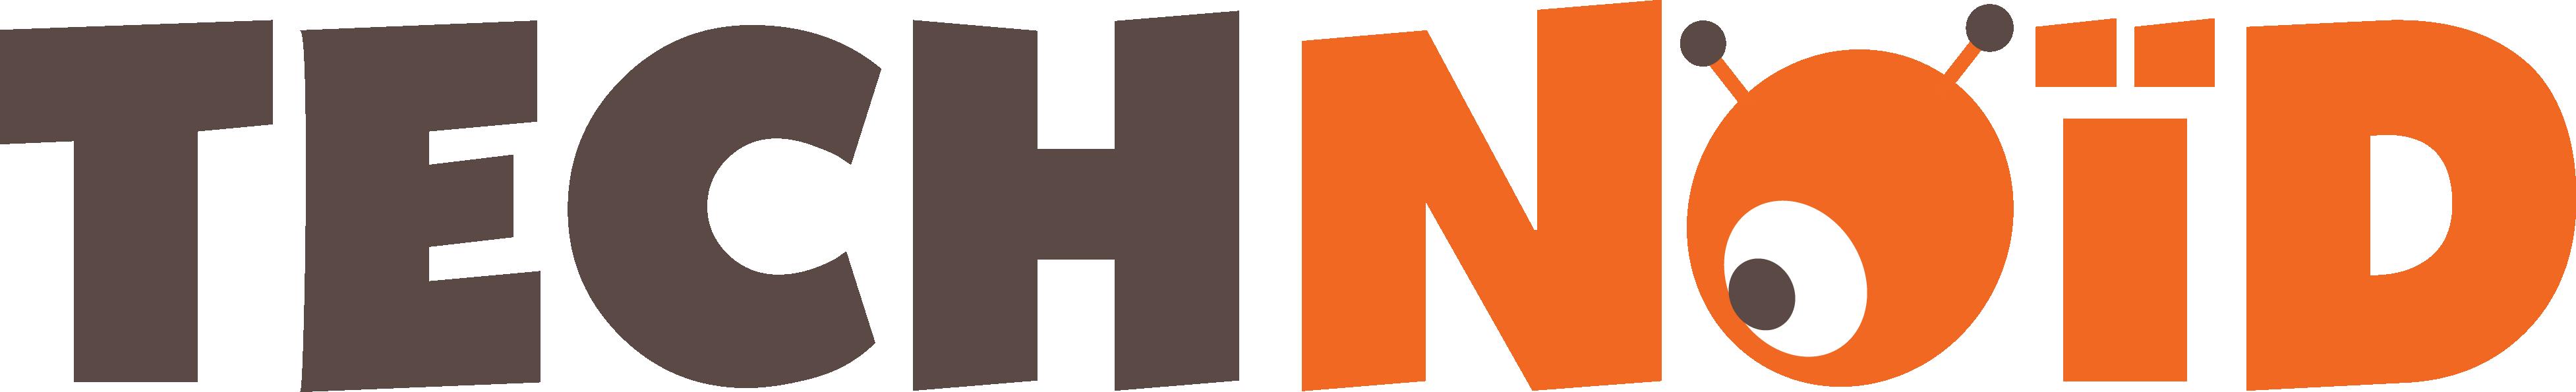 TechnoidFR